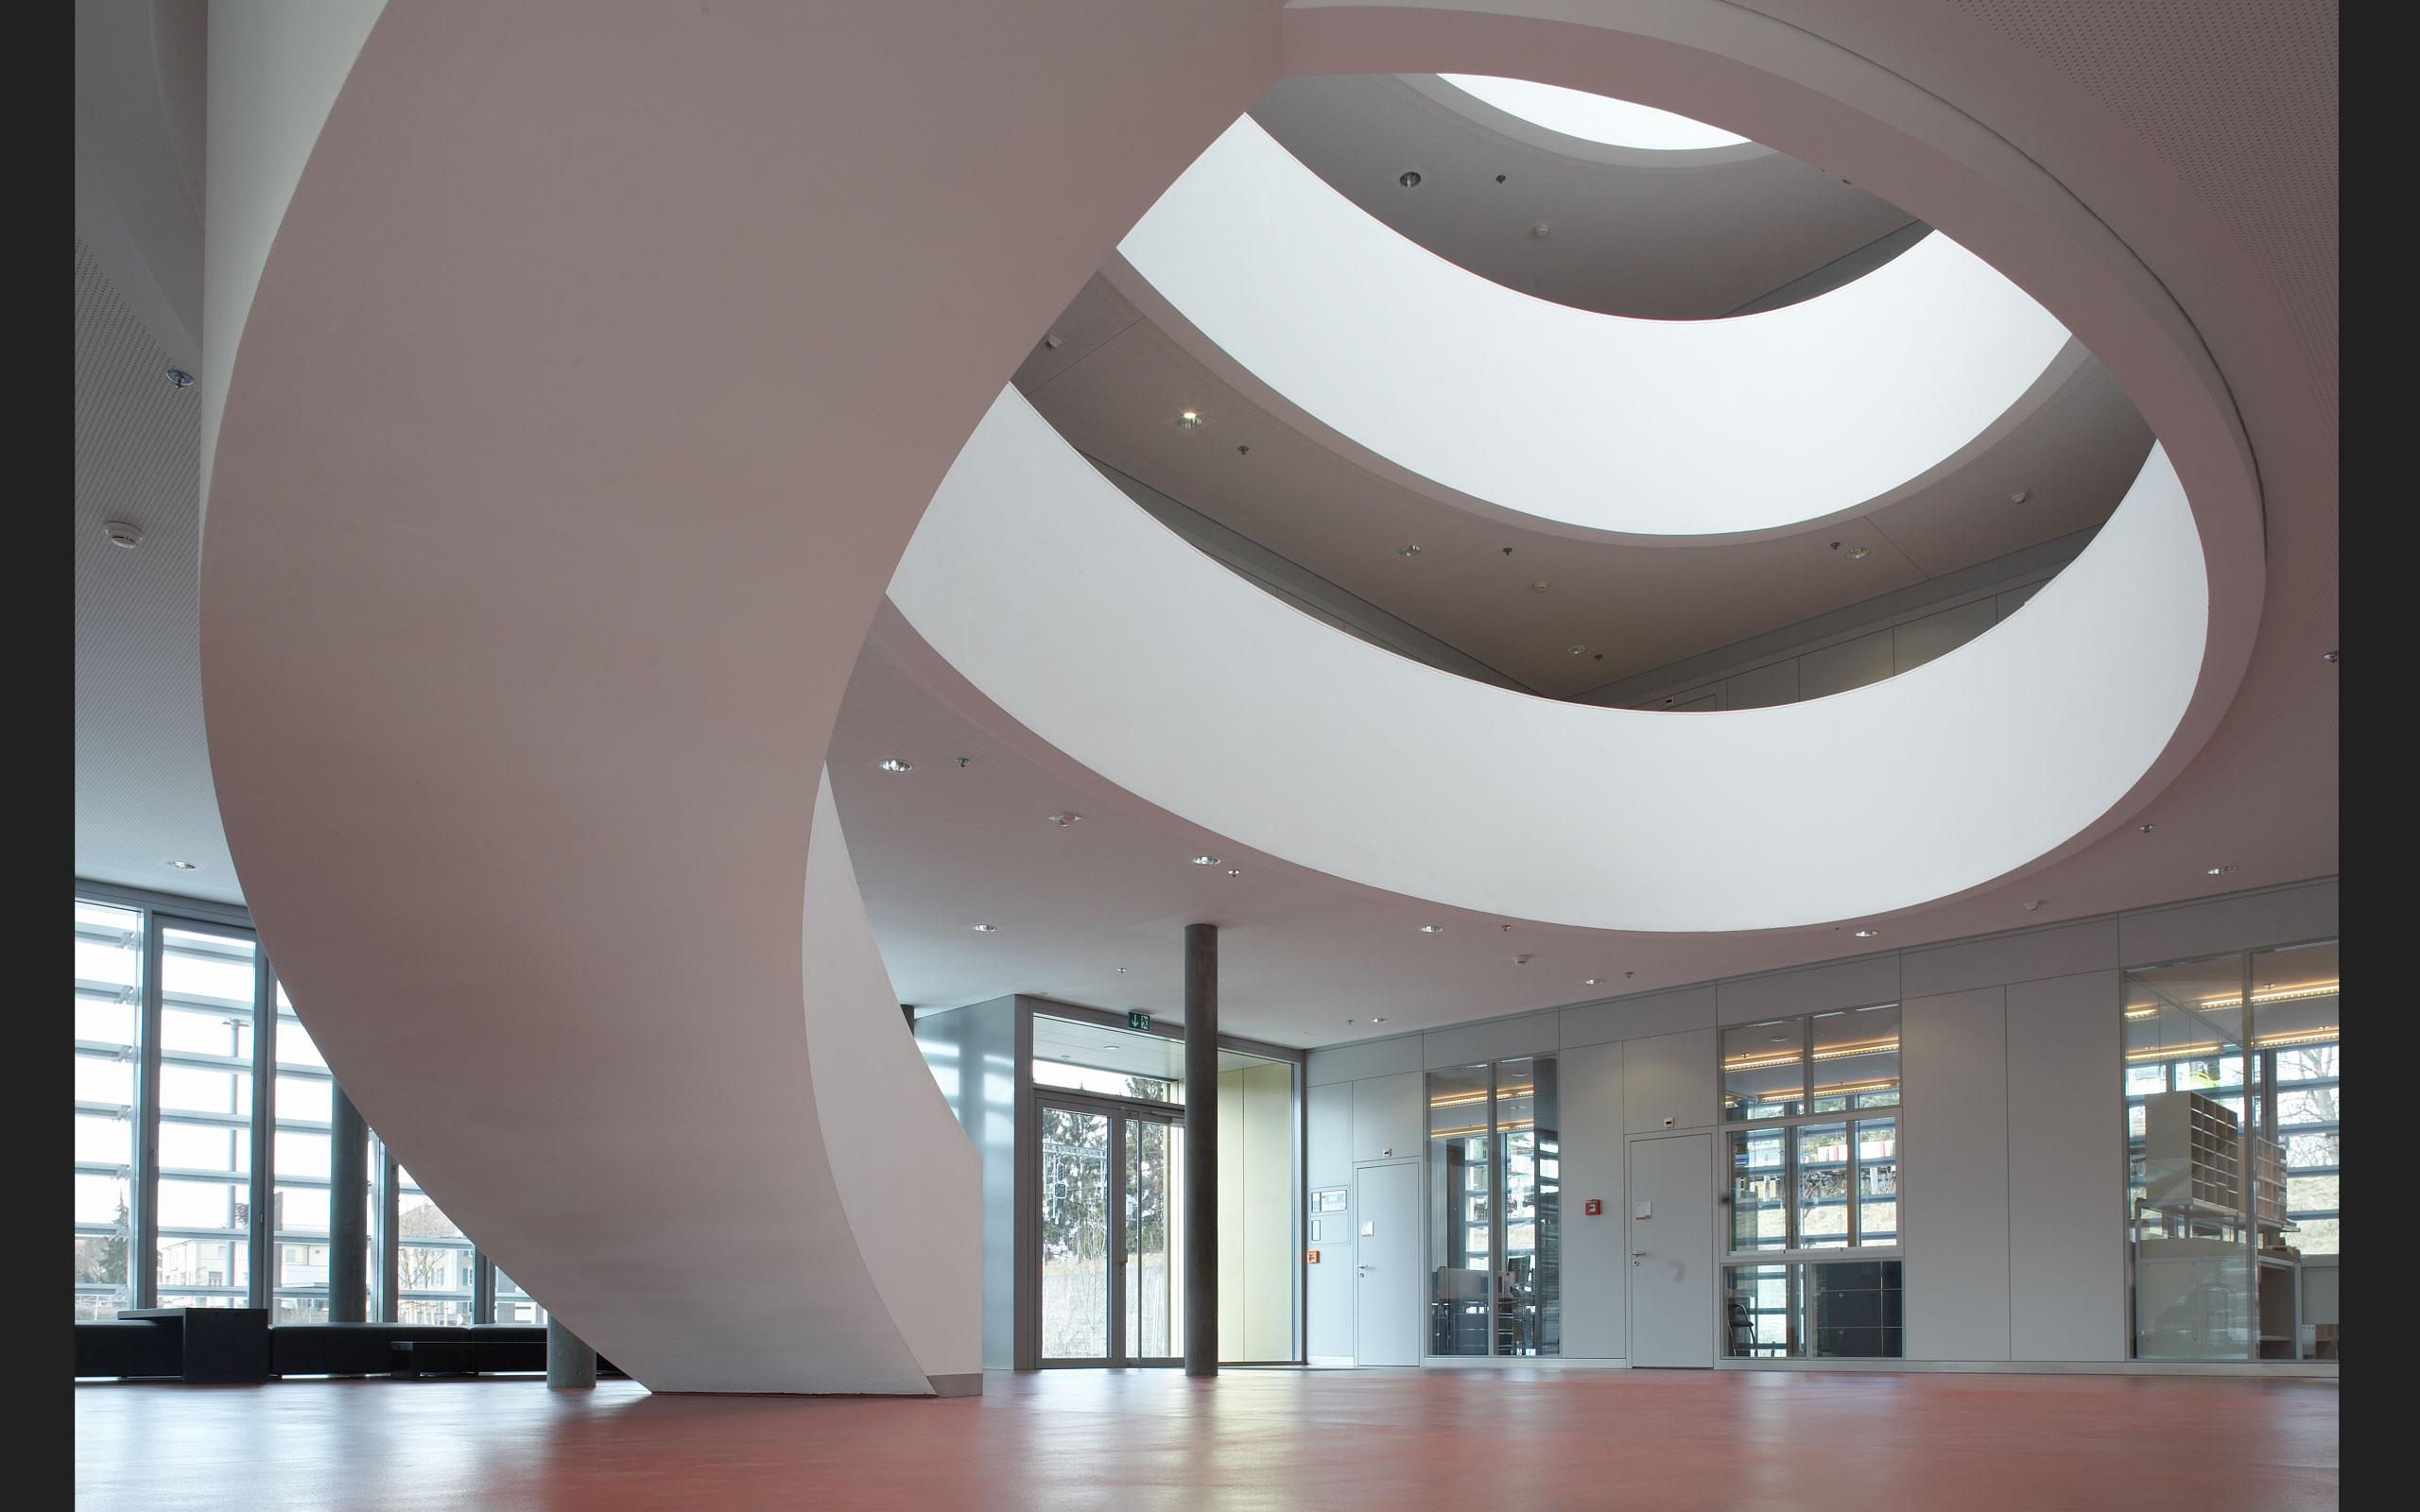 Architektur S+K Schenk, Neubau EWB, Bern